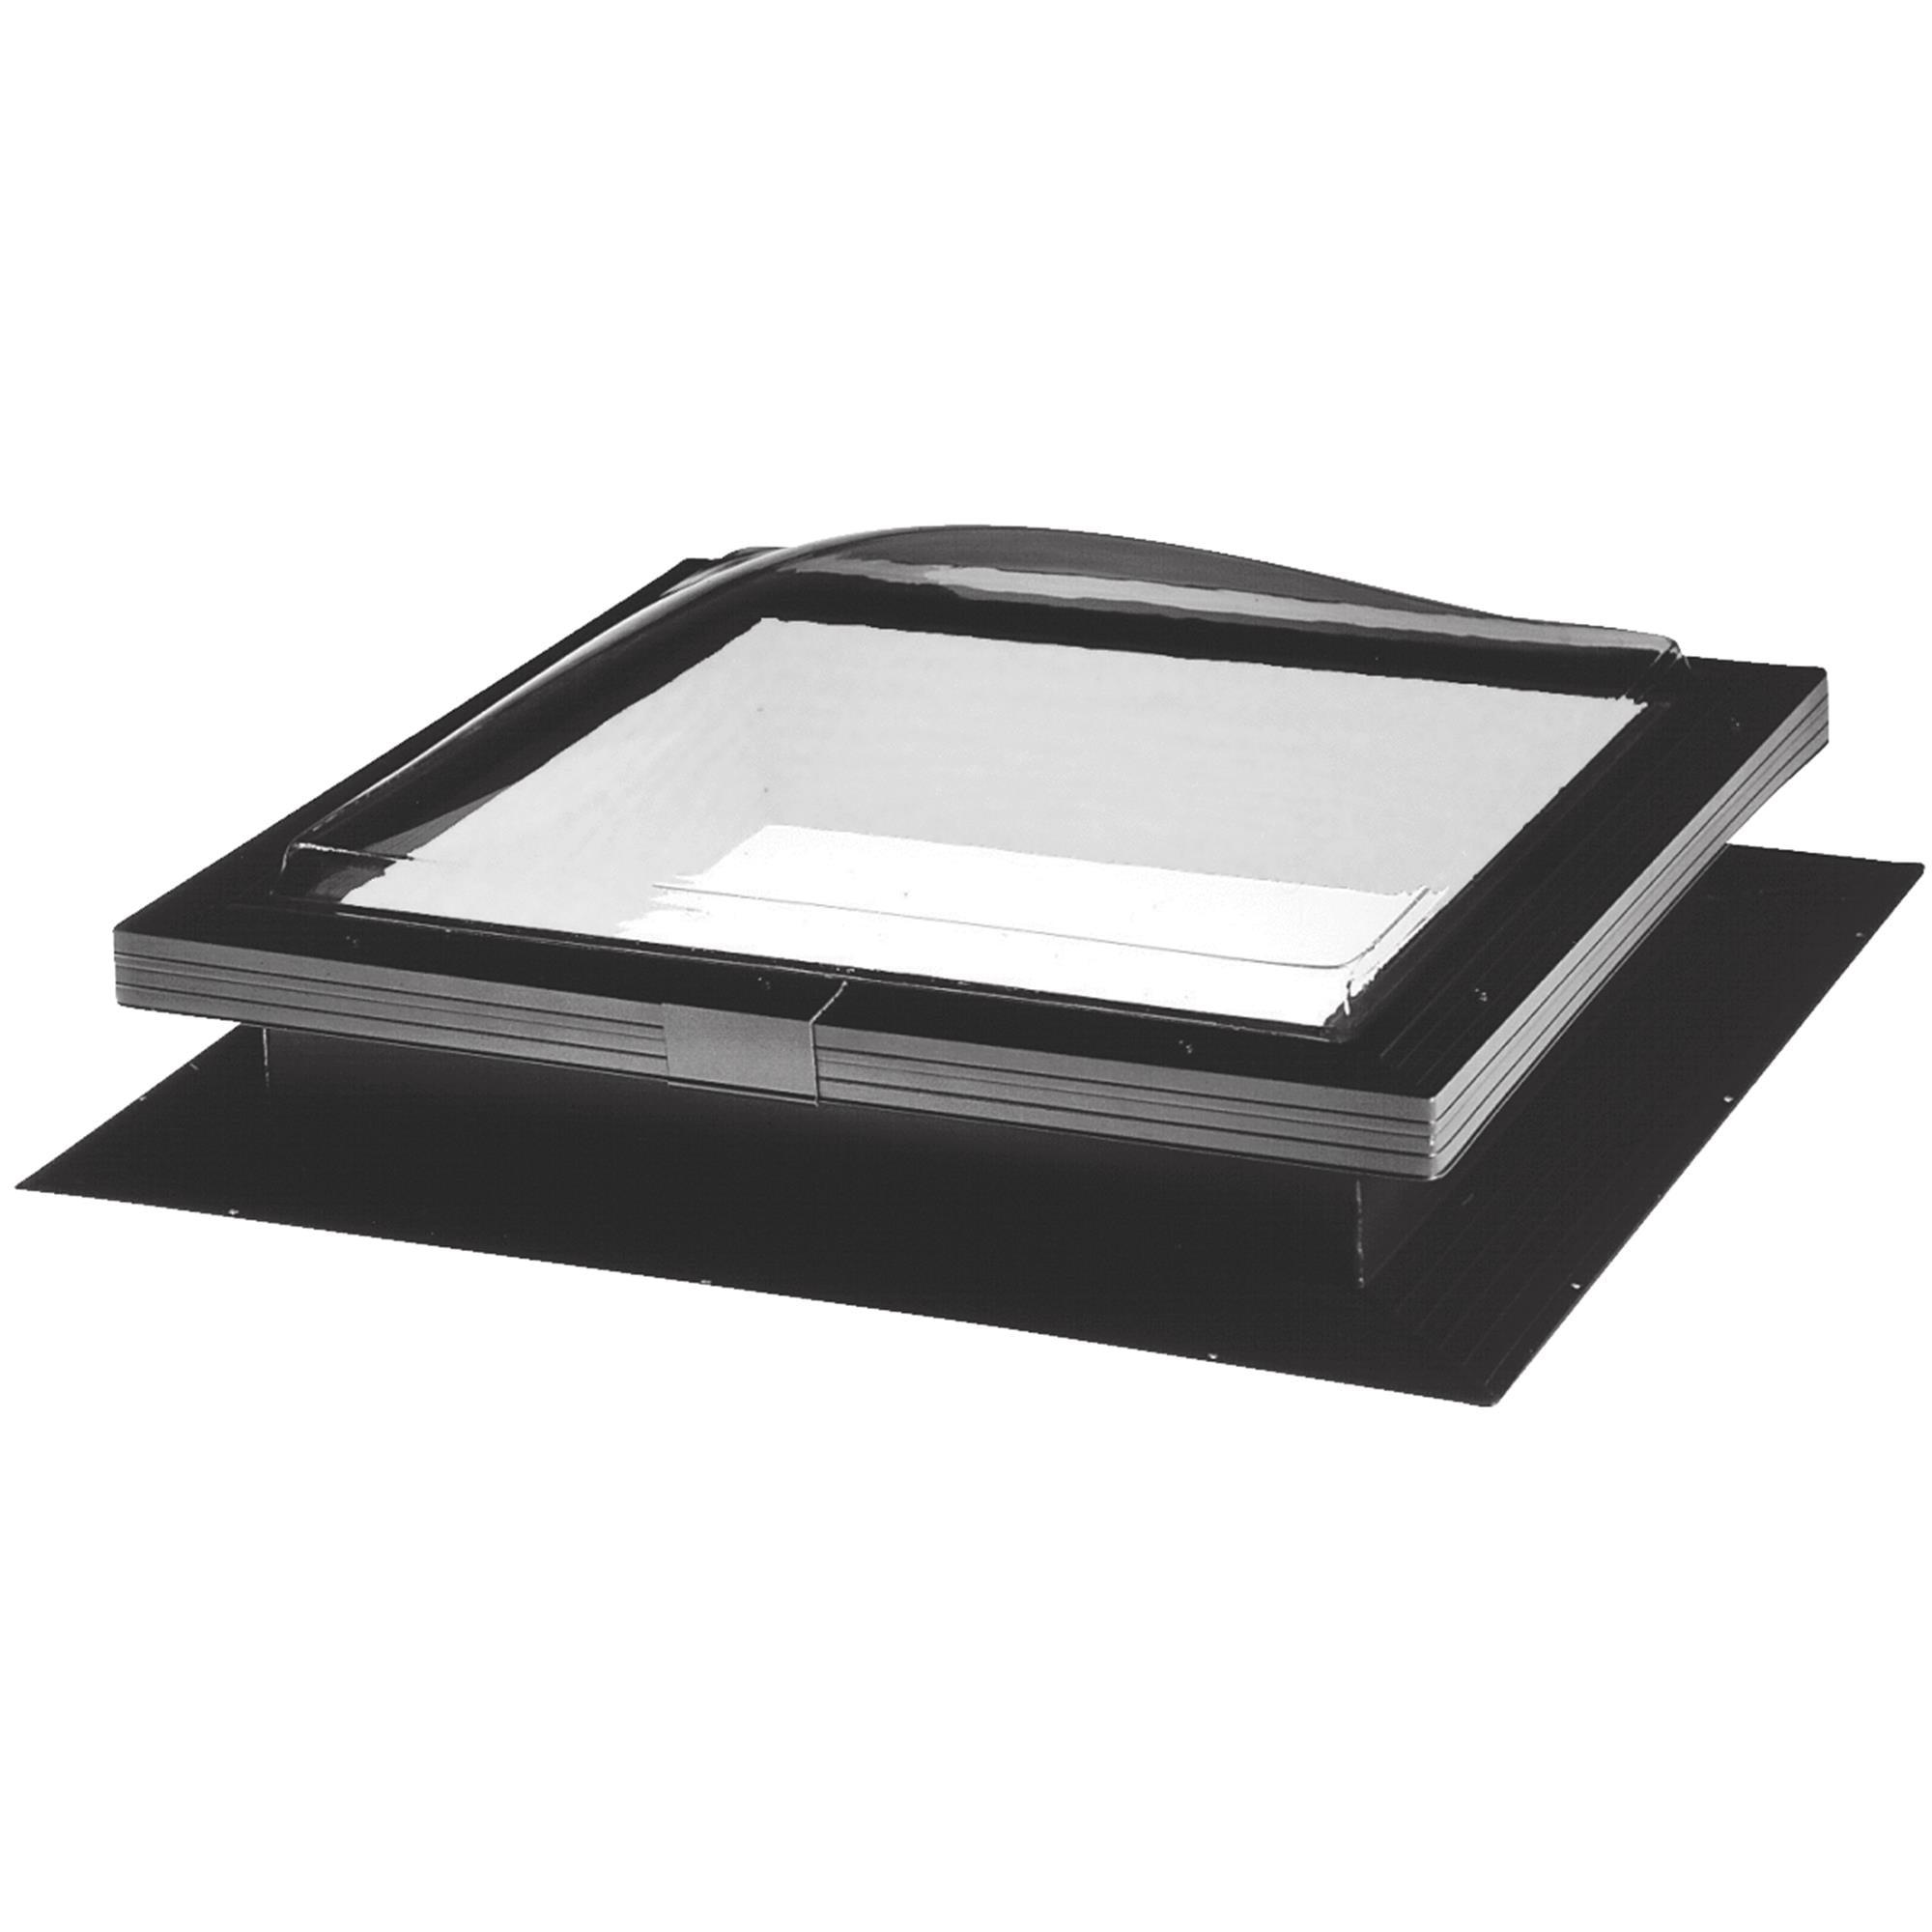 Sun-Tek Self-Flashing Skylight With Frame